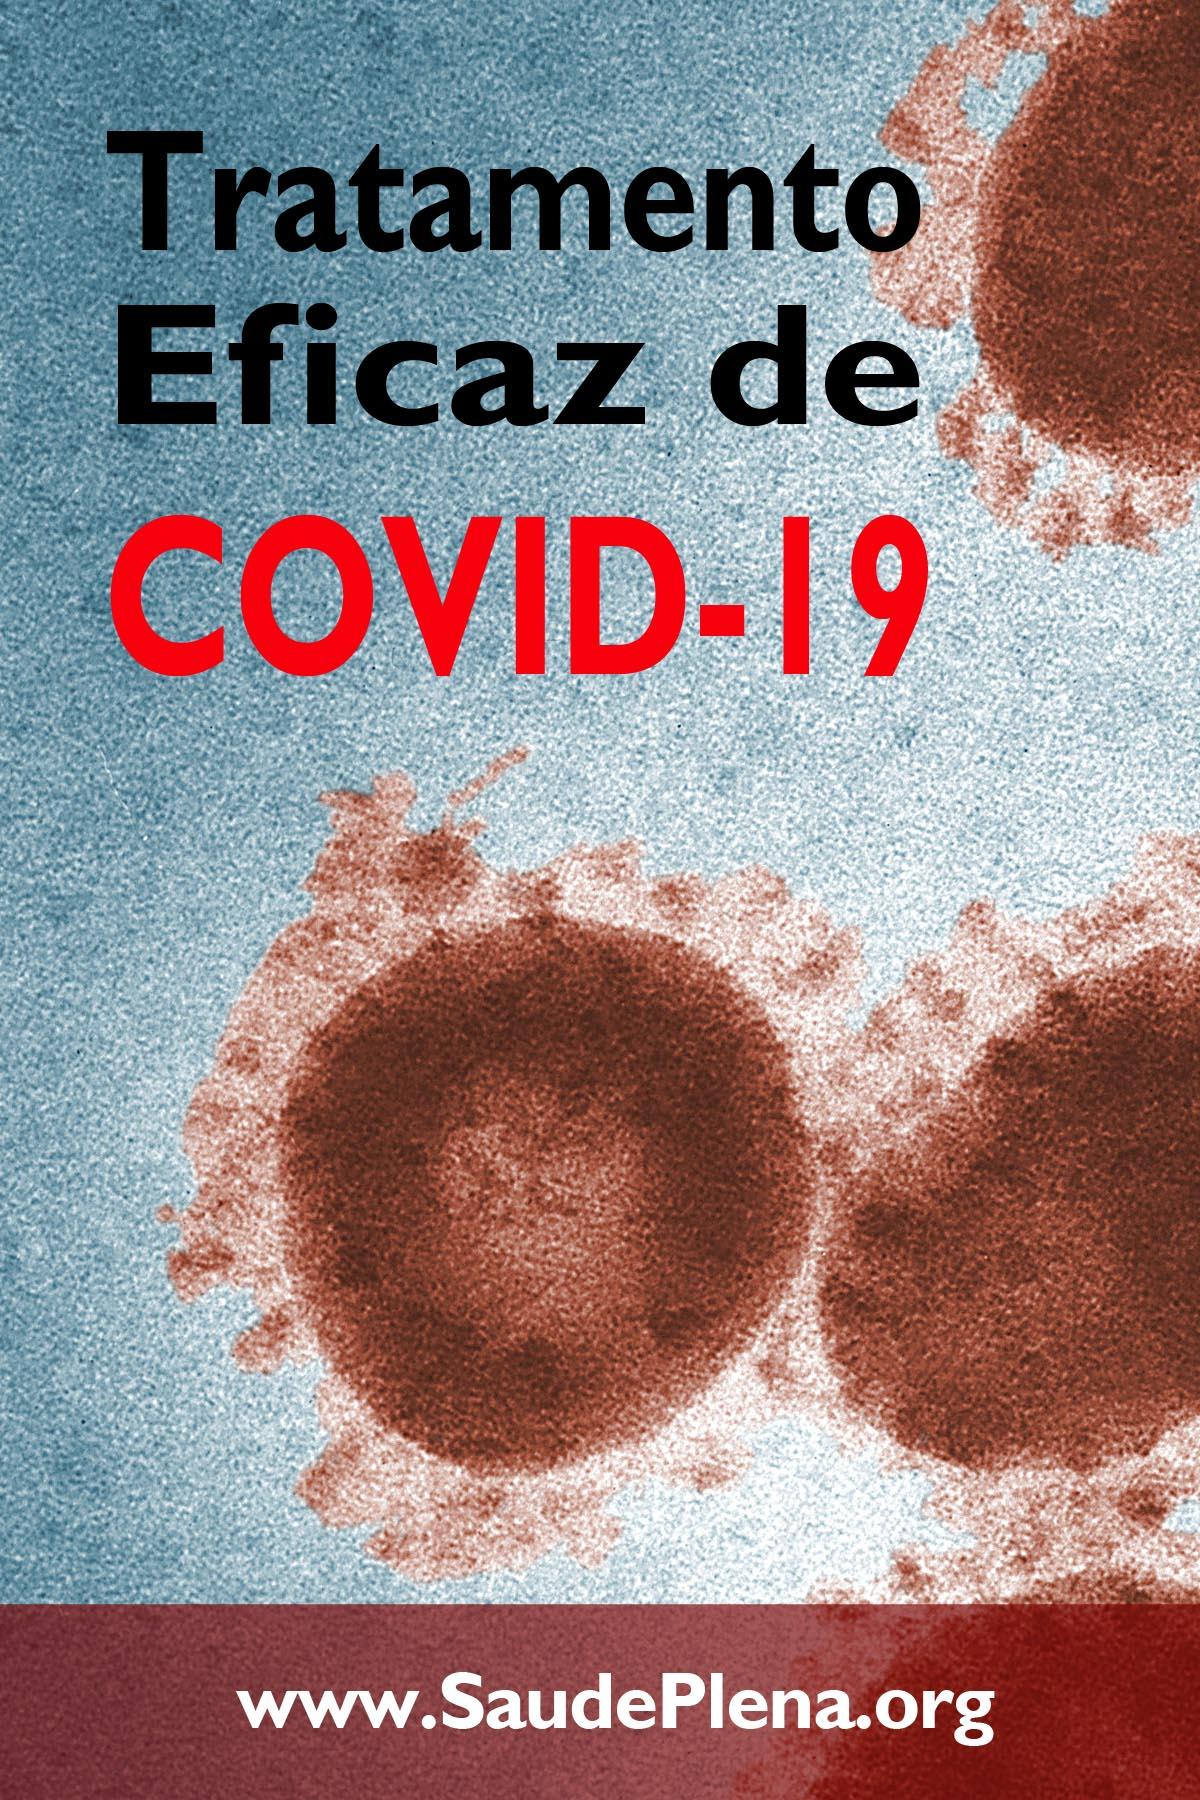 Tratamento Eficaz de COVID-19